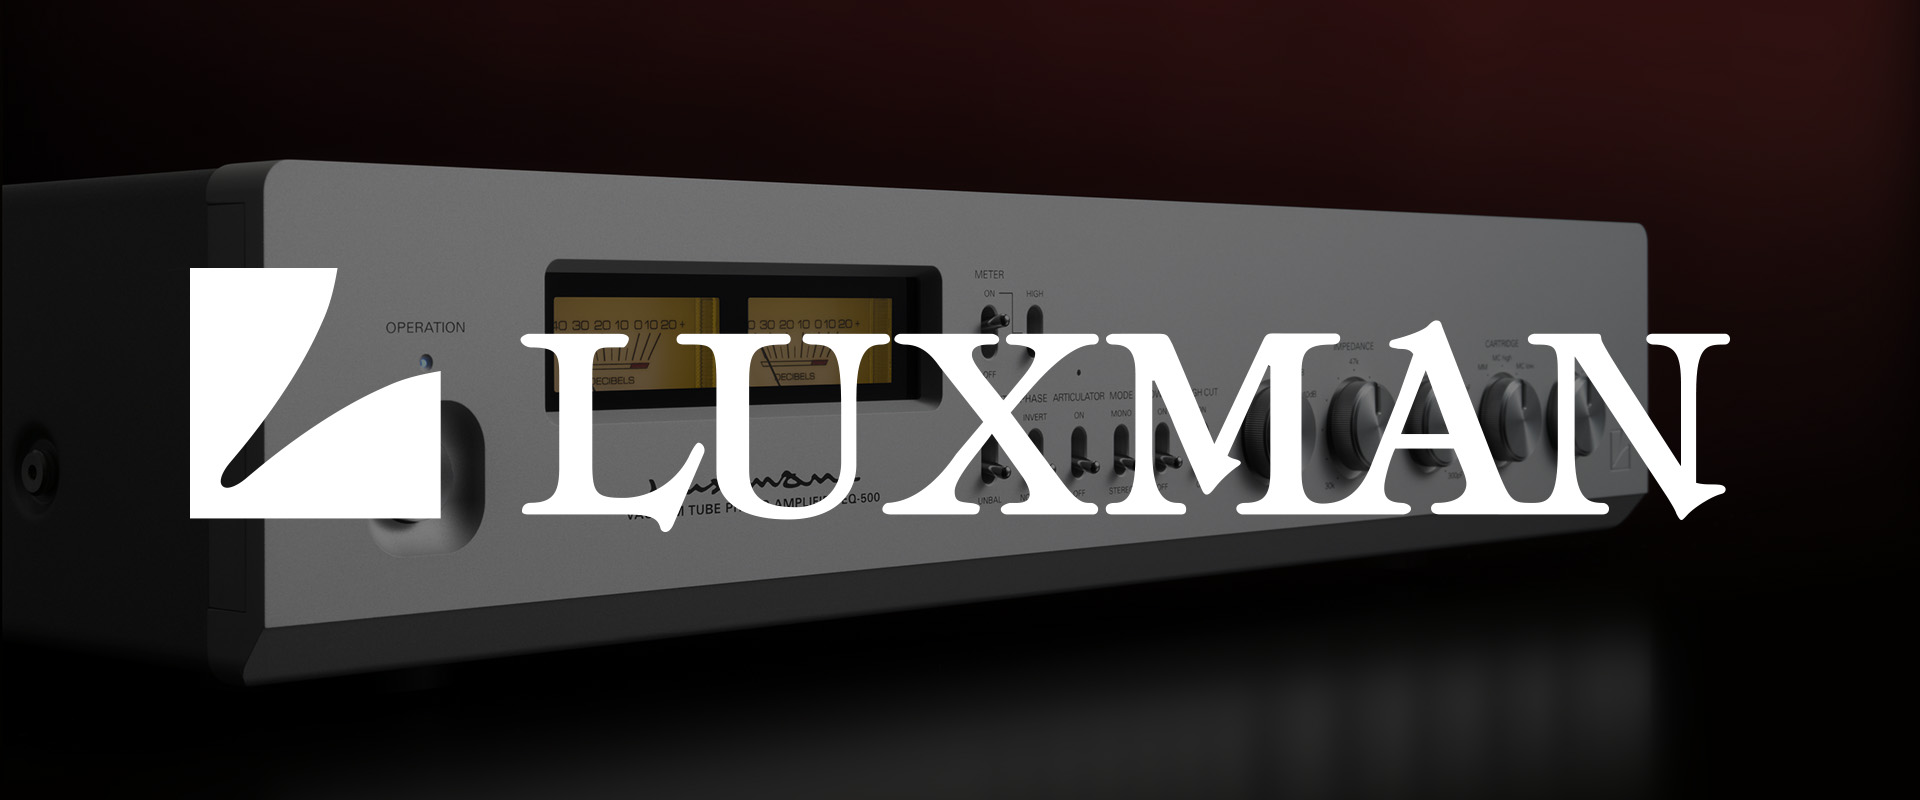 Luxman - Chattelin Audio Systems